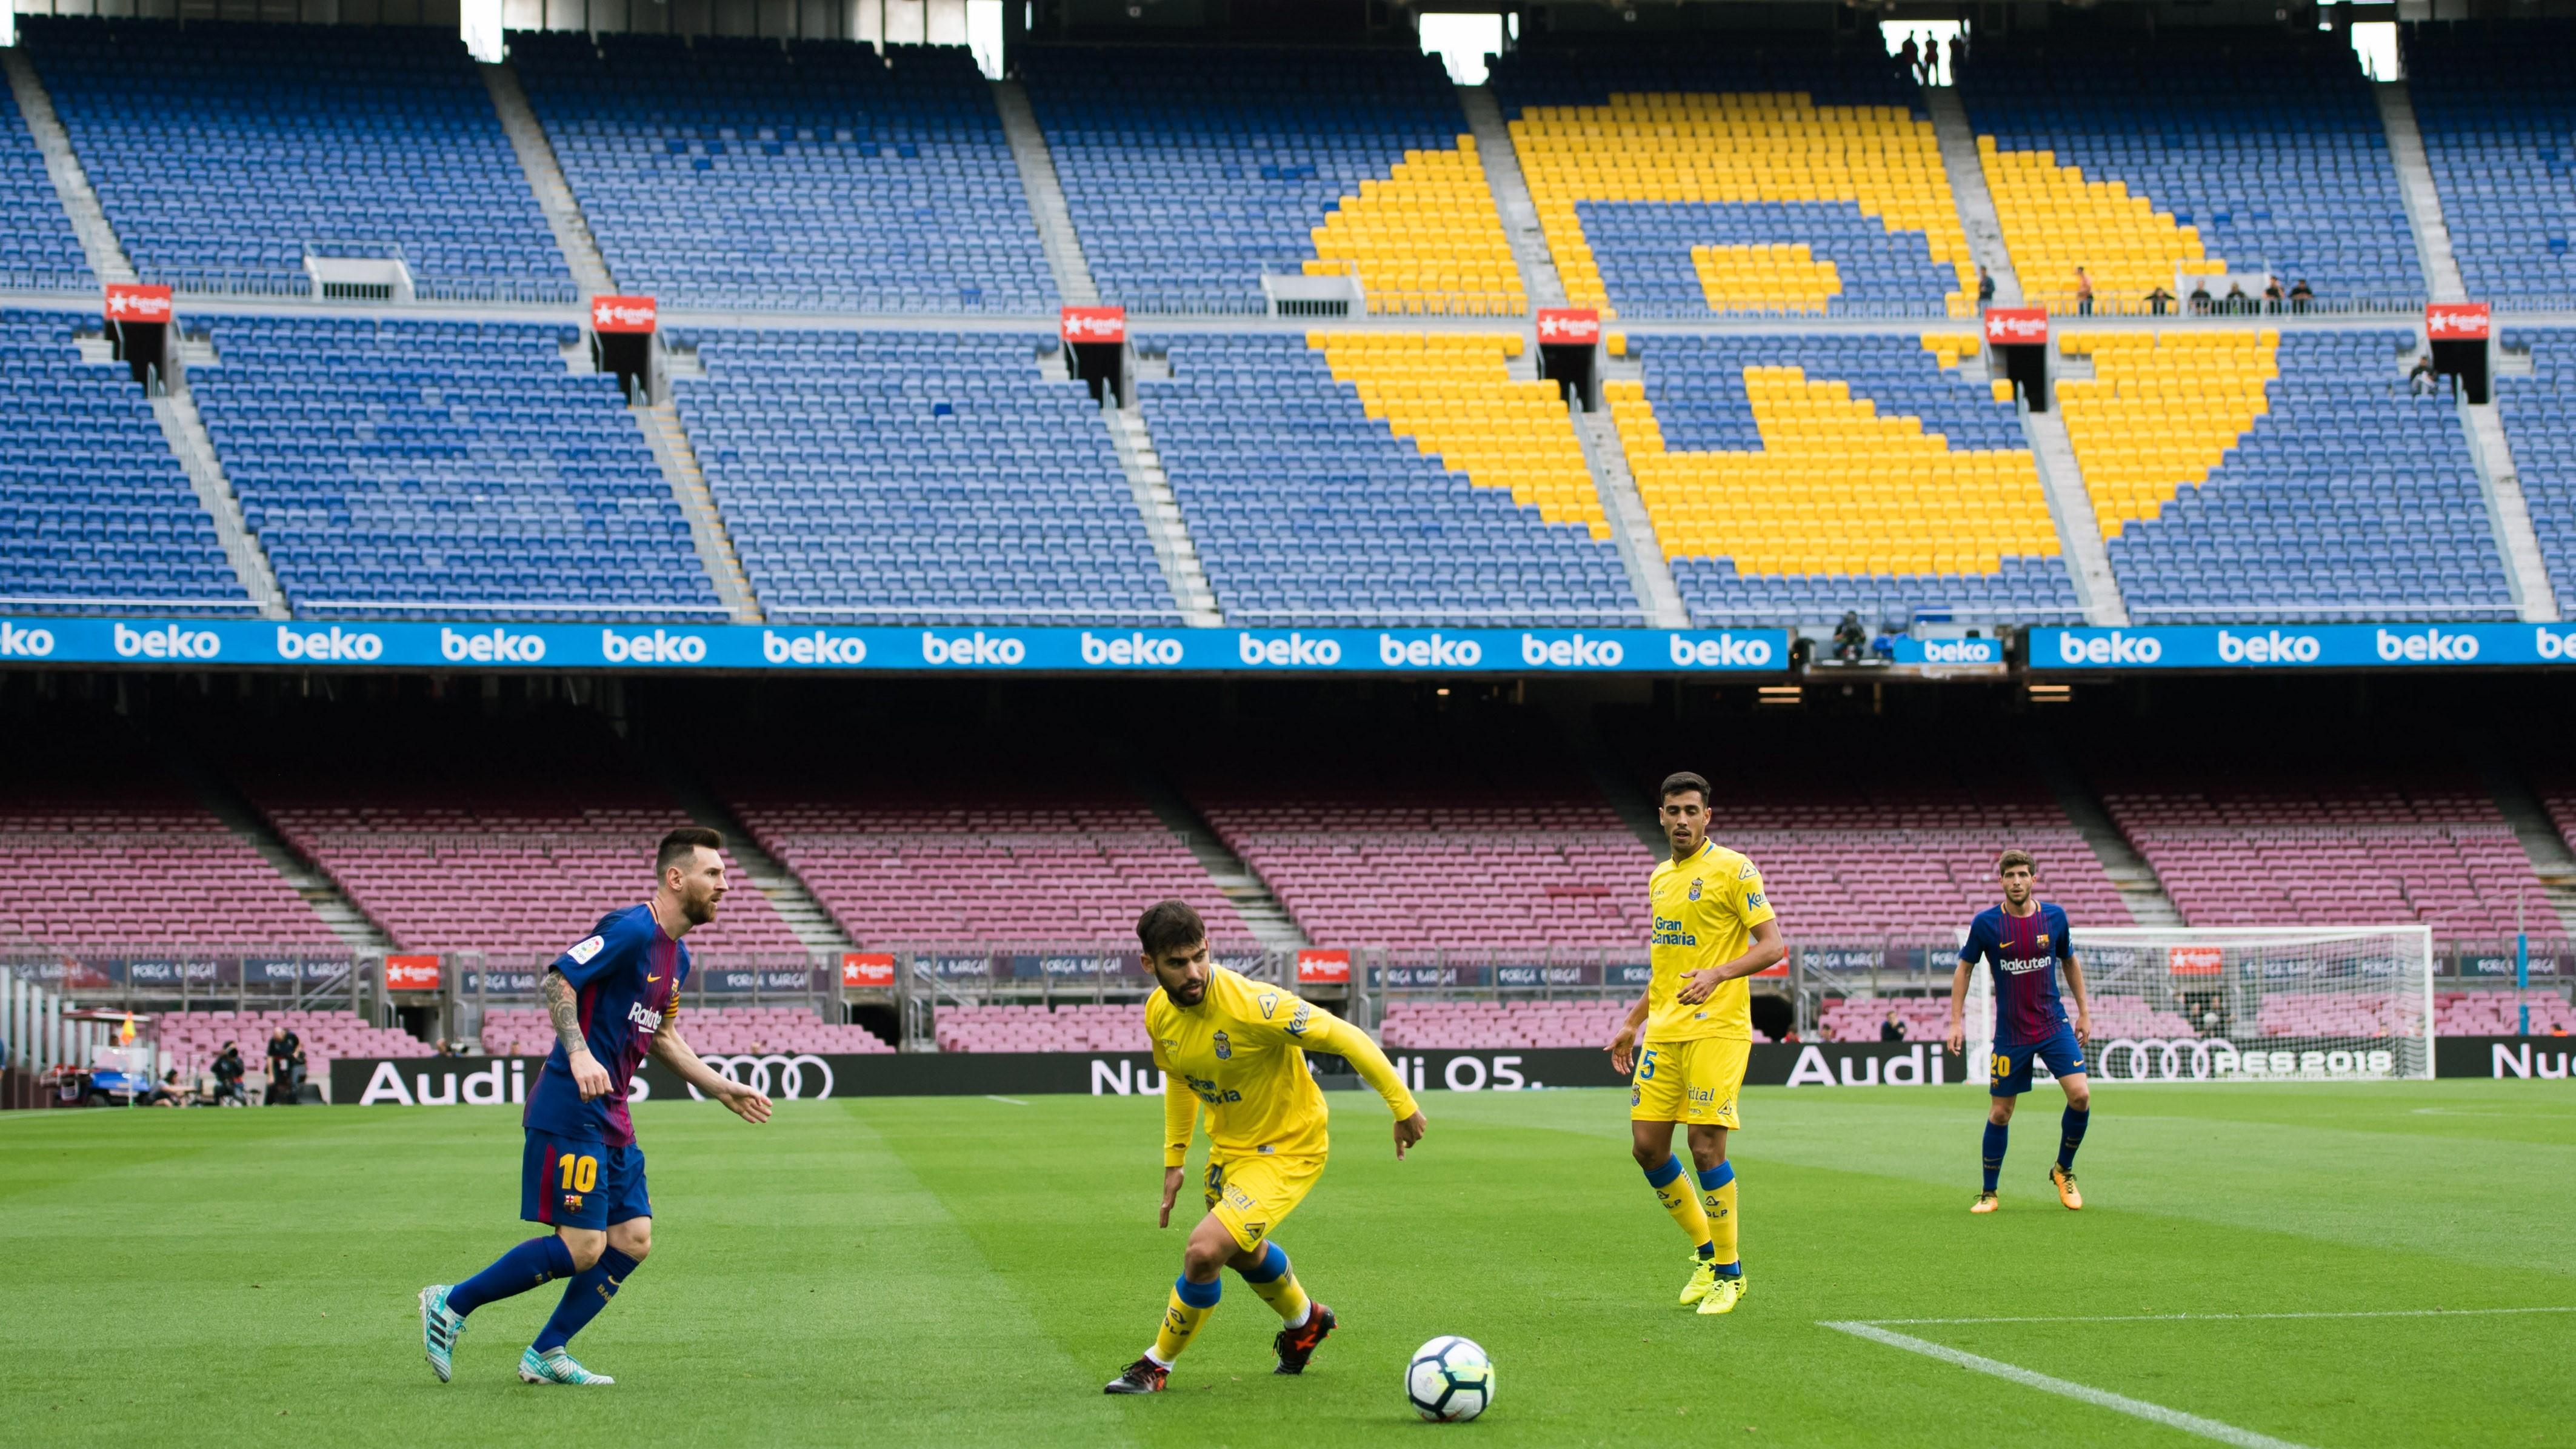 Lionel Messi Camp Nou Barcelona Las Palmas LALiga 01102017